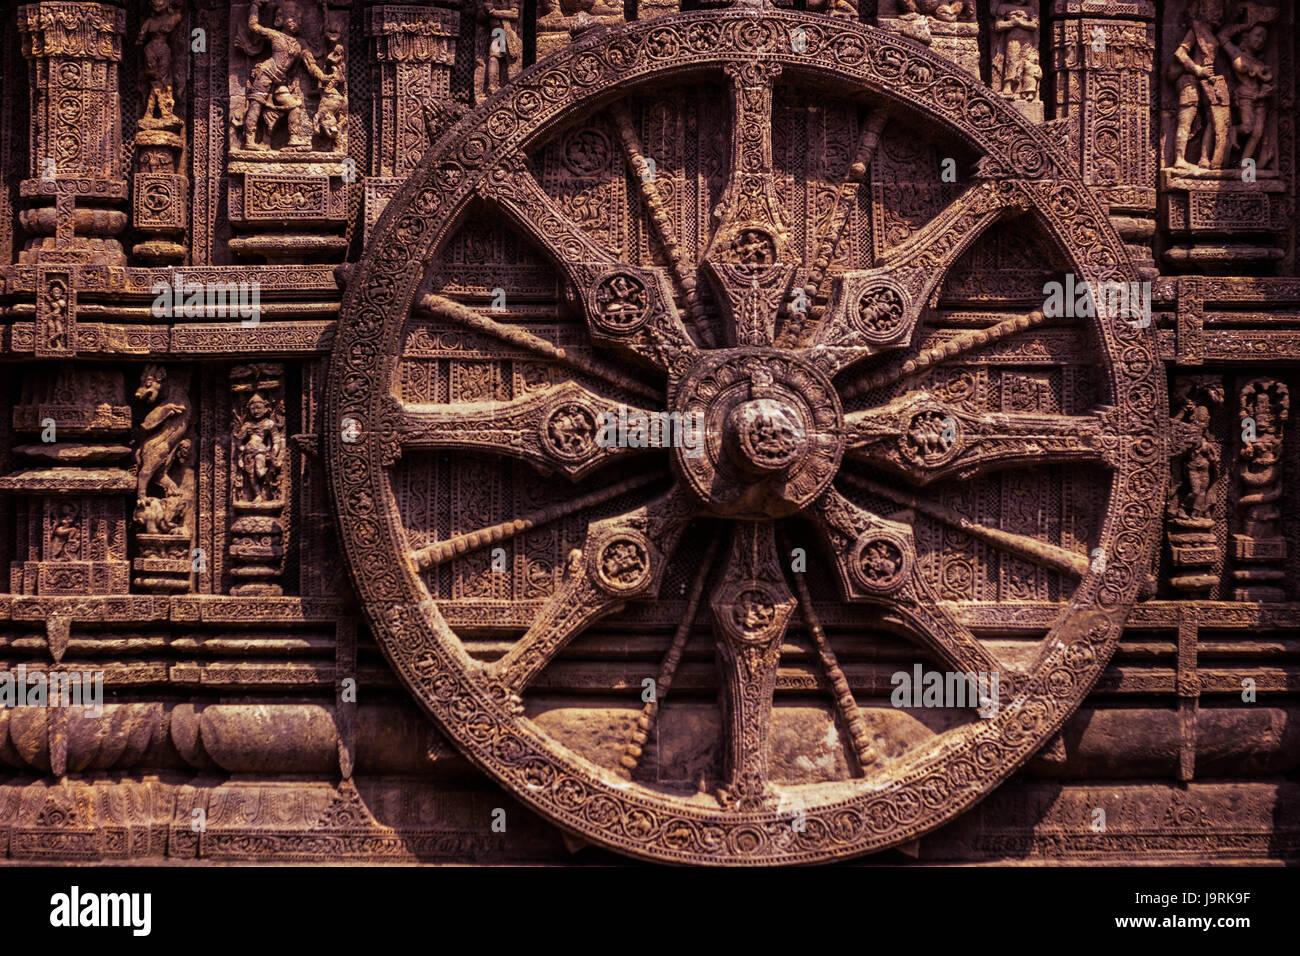 The Konark Sun temple - Stock Image